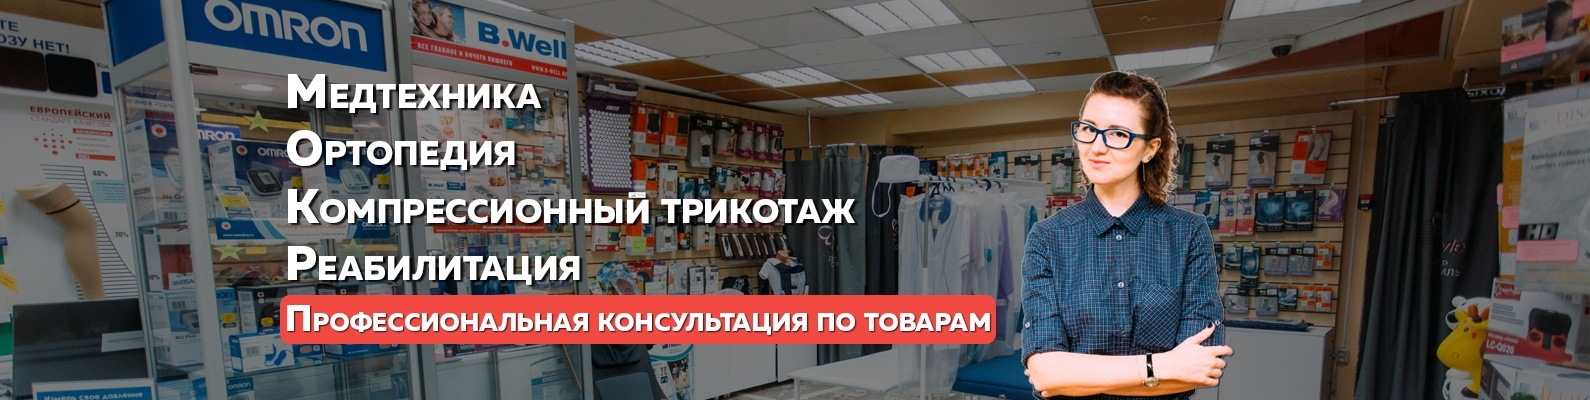 Медтехника №7 Москва - интернет-магазин  Медицинская ...